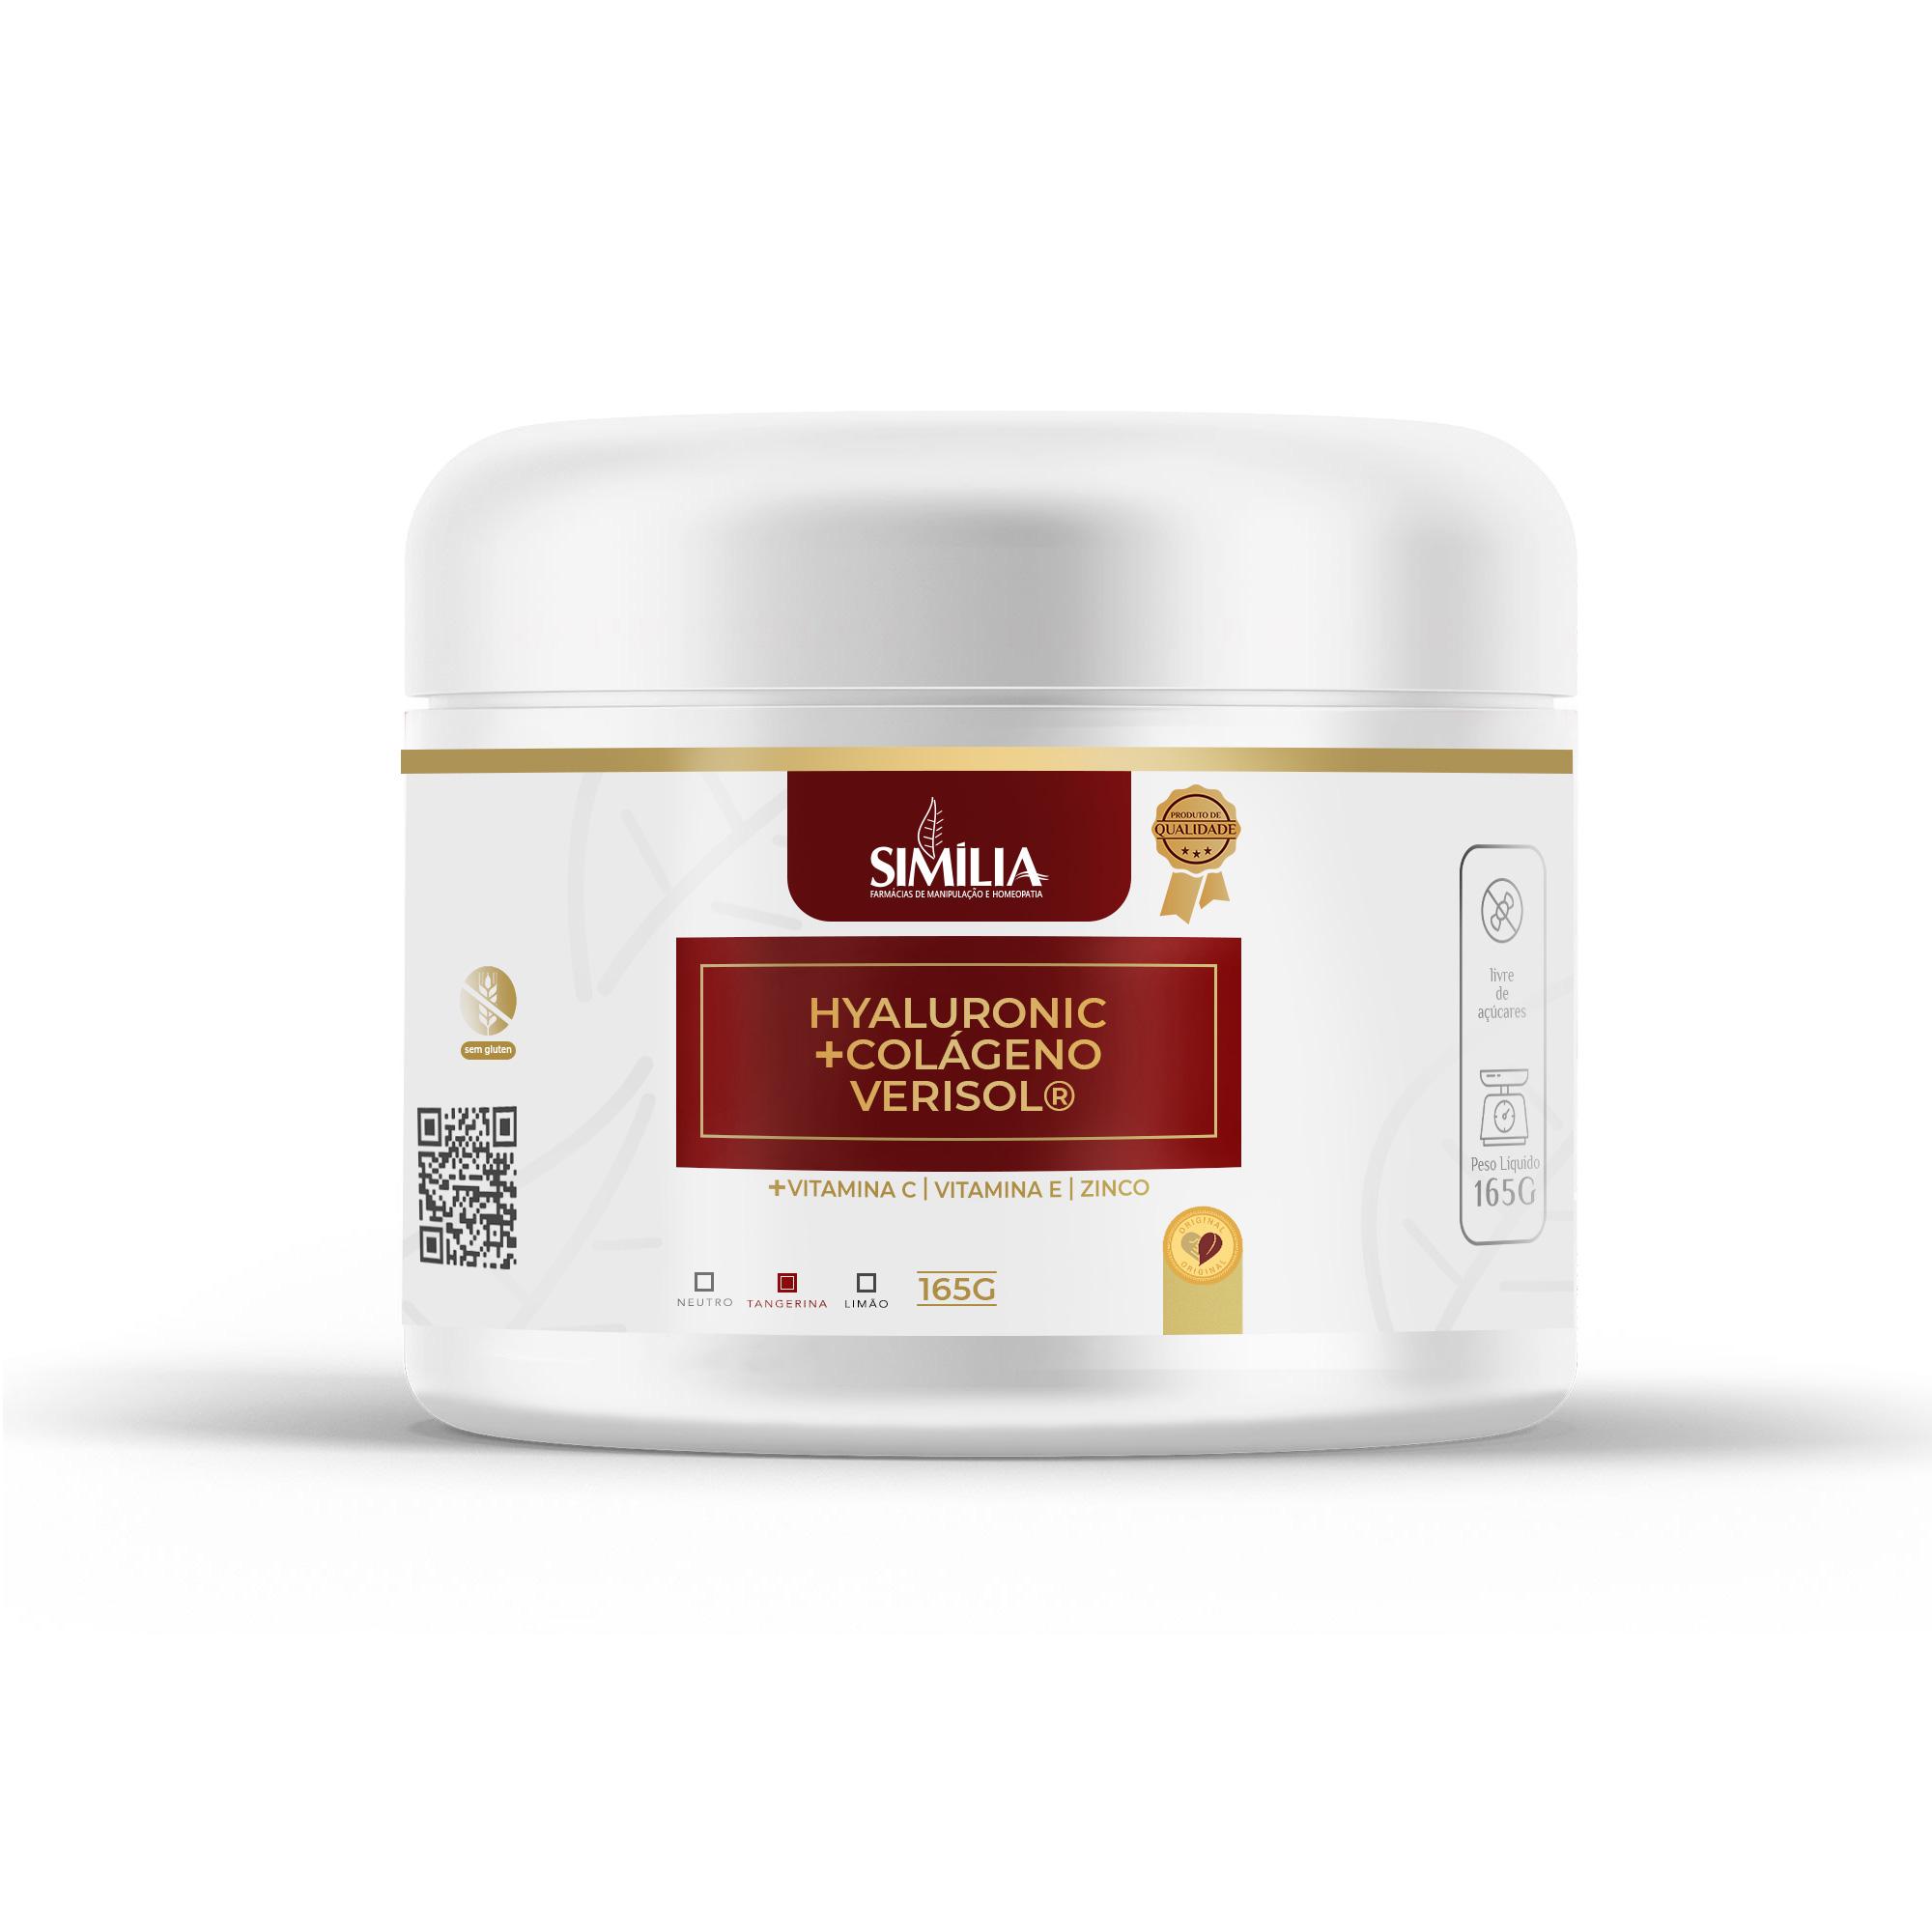 Hyaluronic Colágeno Verisol® + Ácido Hialurônico Sabor Tangerina 165g